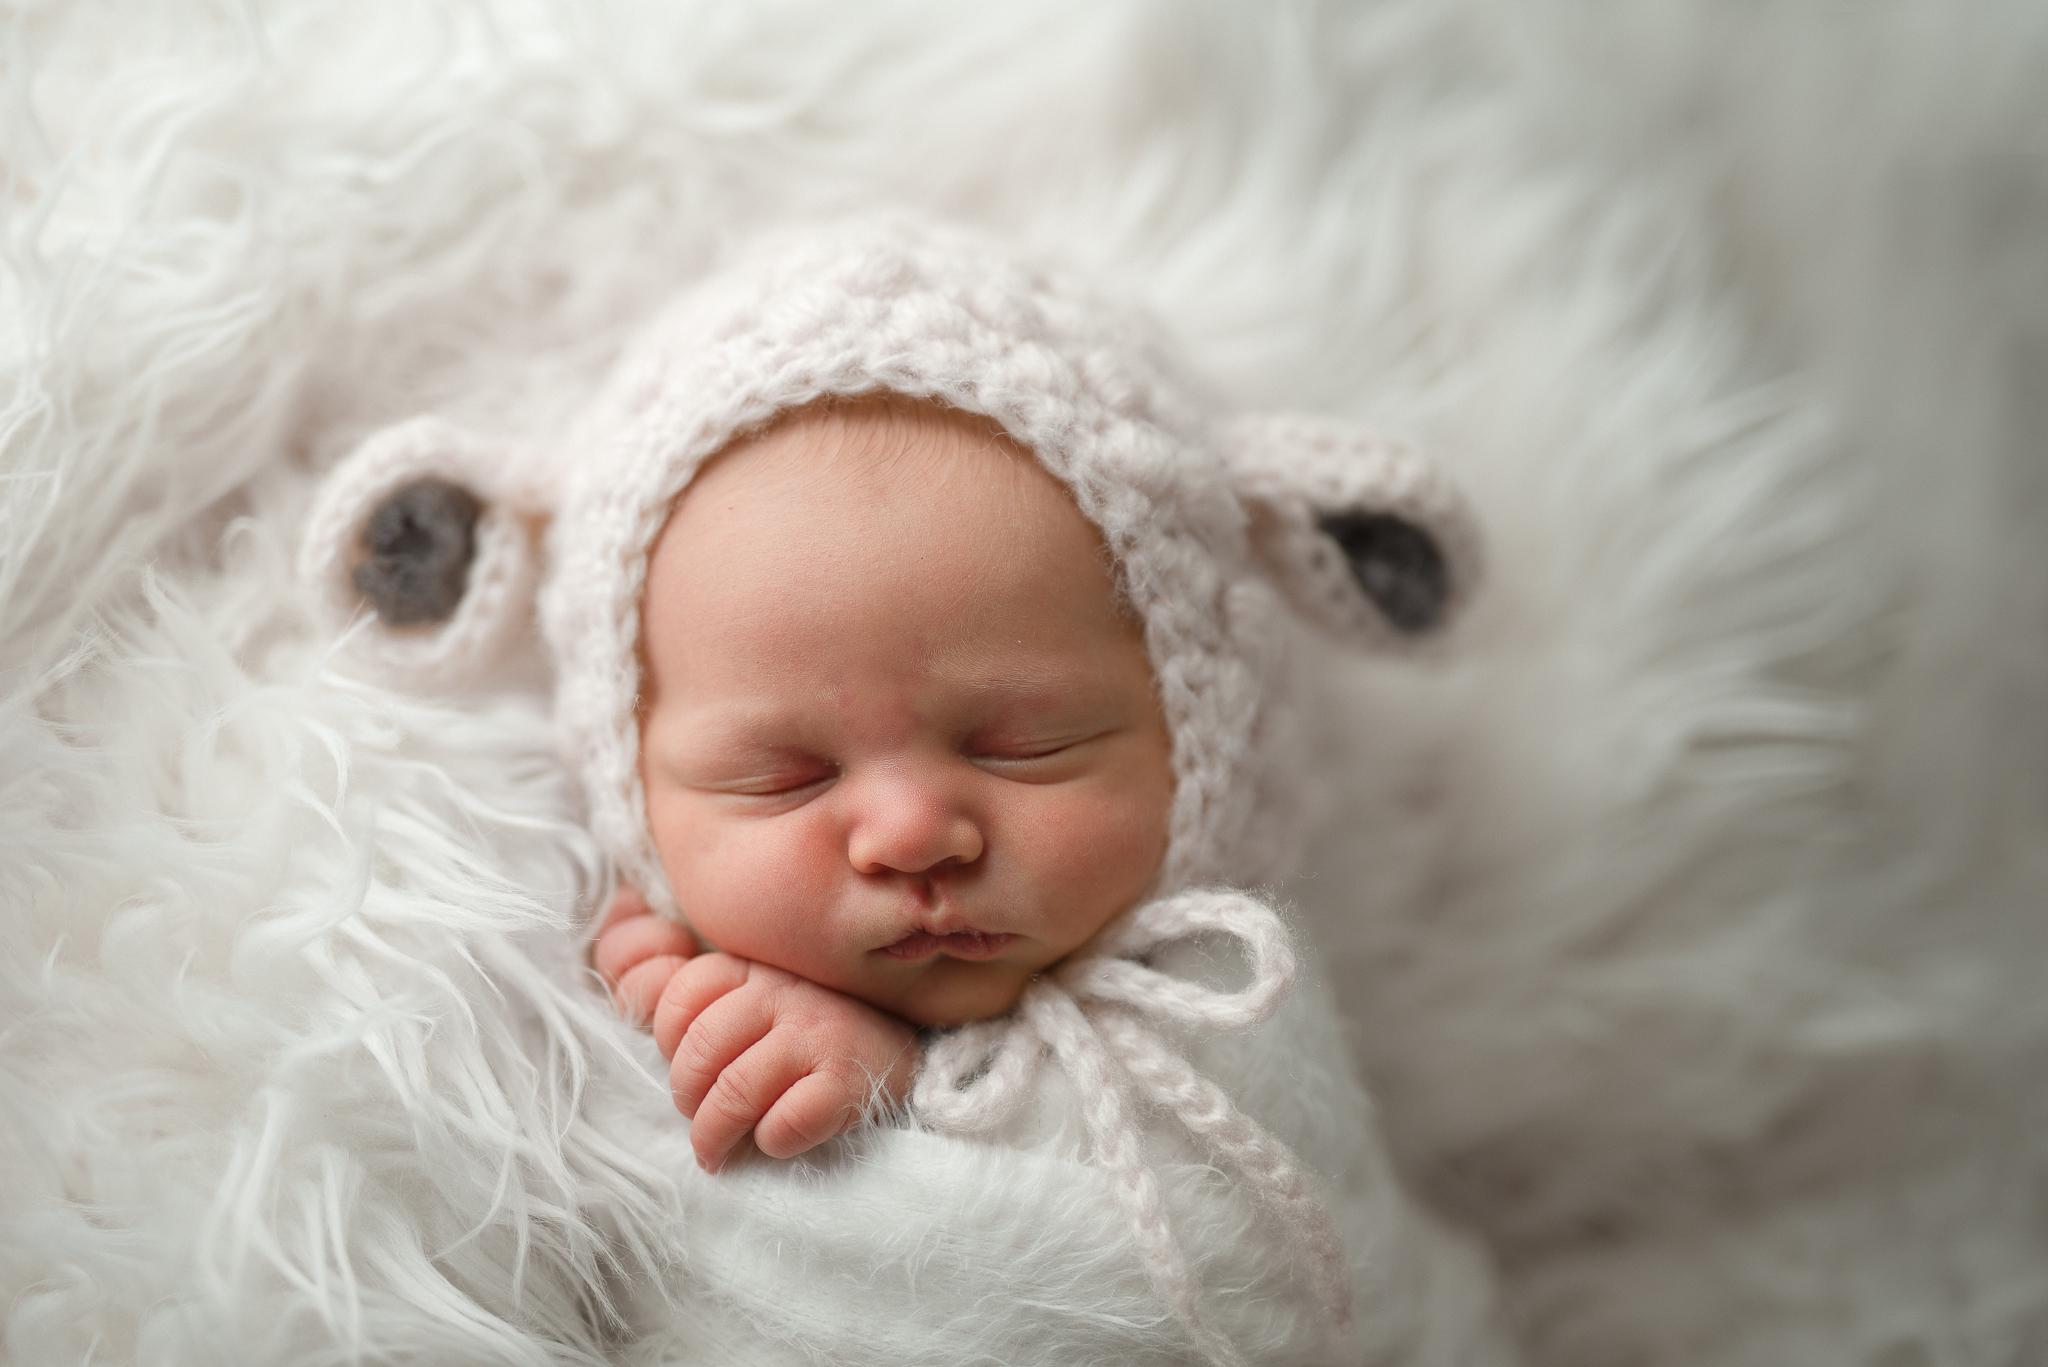 Newborn42NaomiLuciennePhotography032019-Edit.jpg